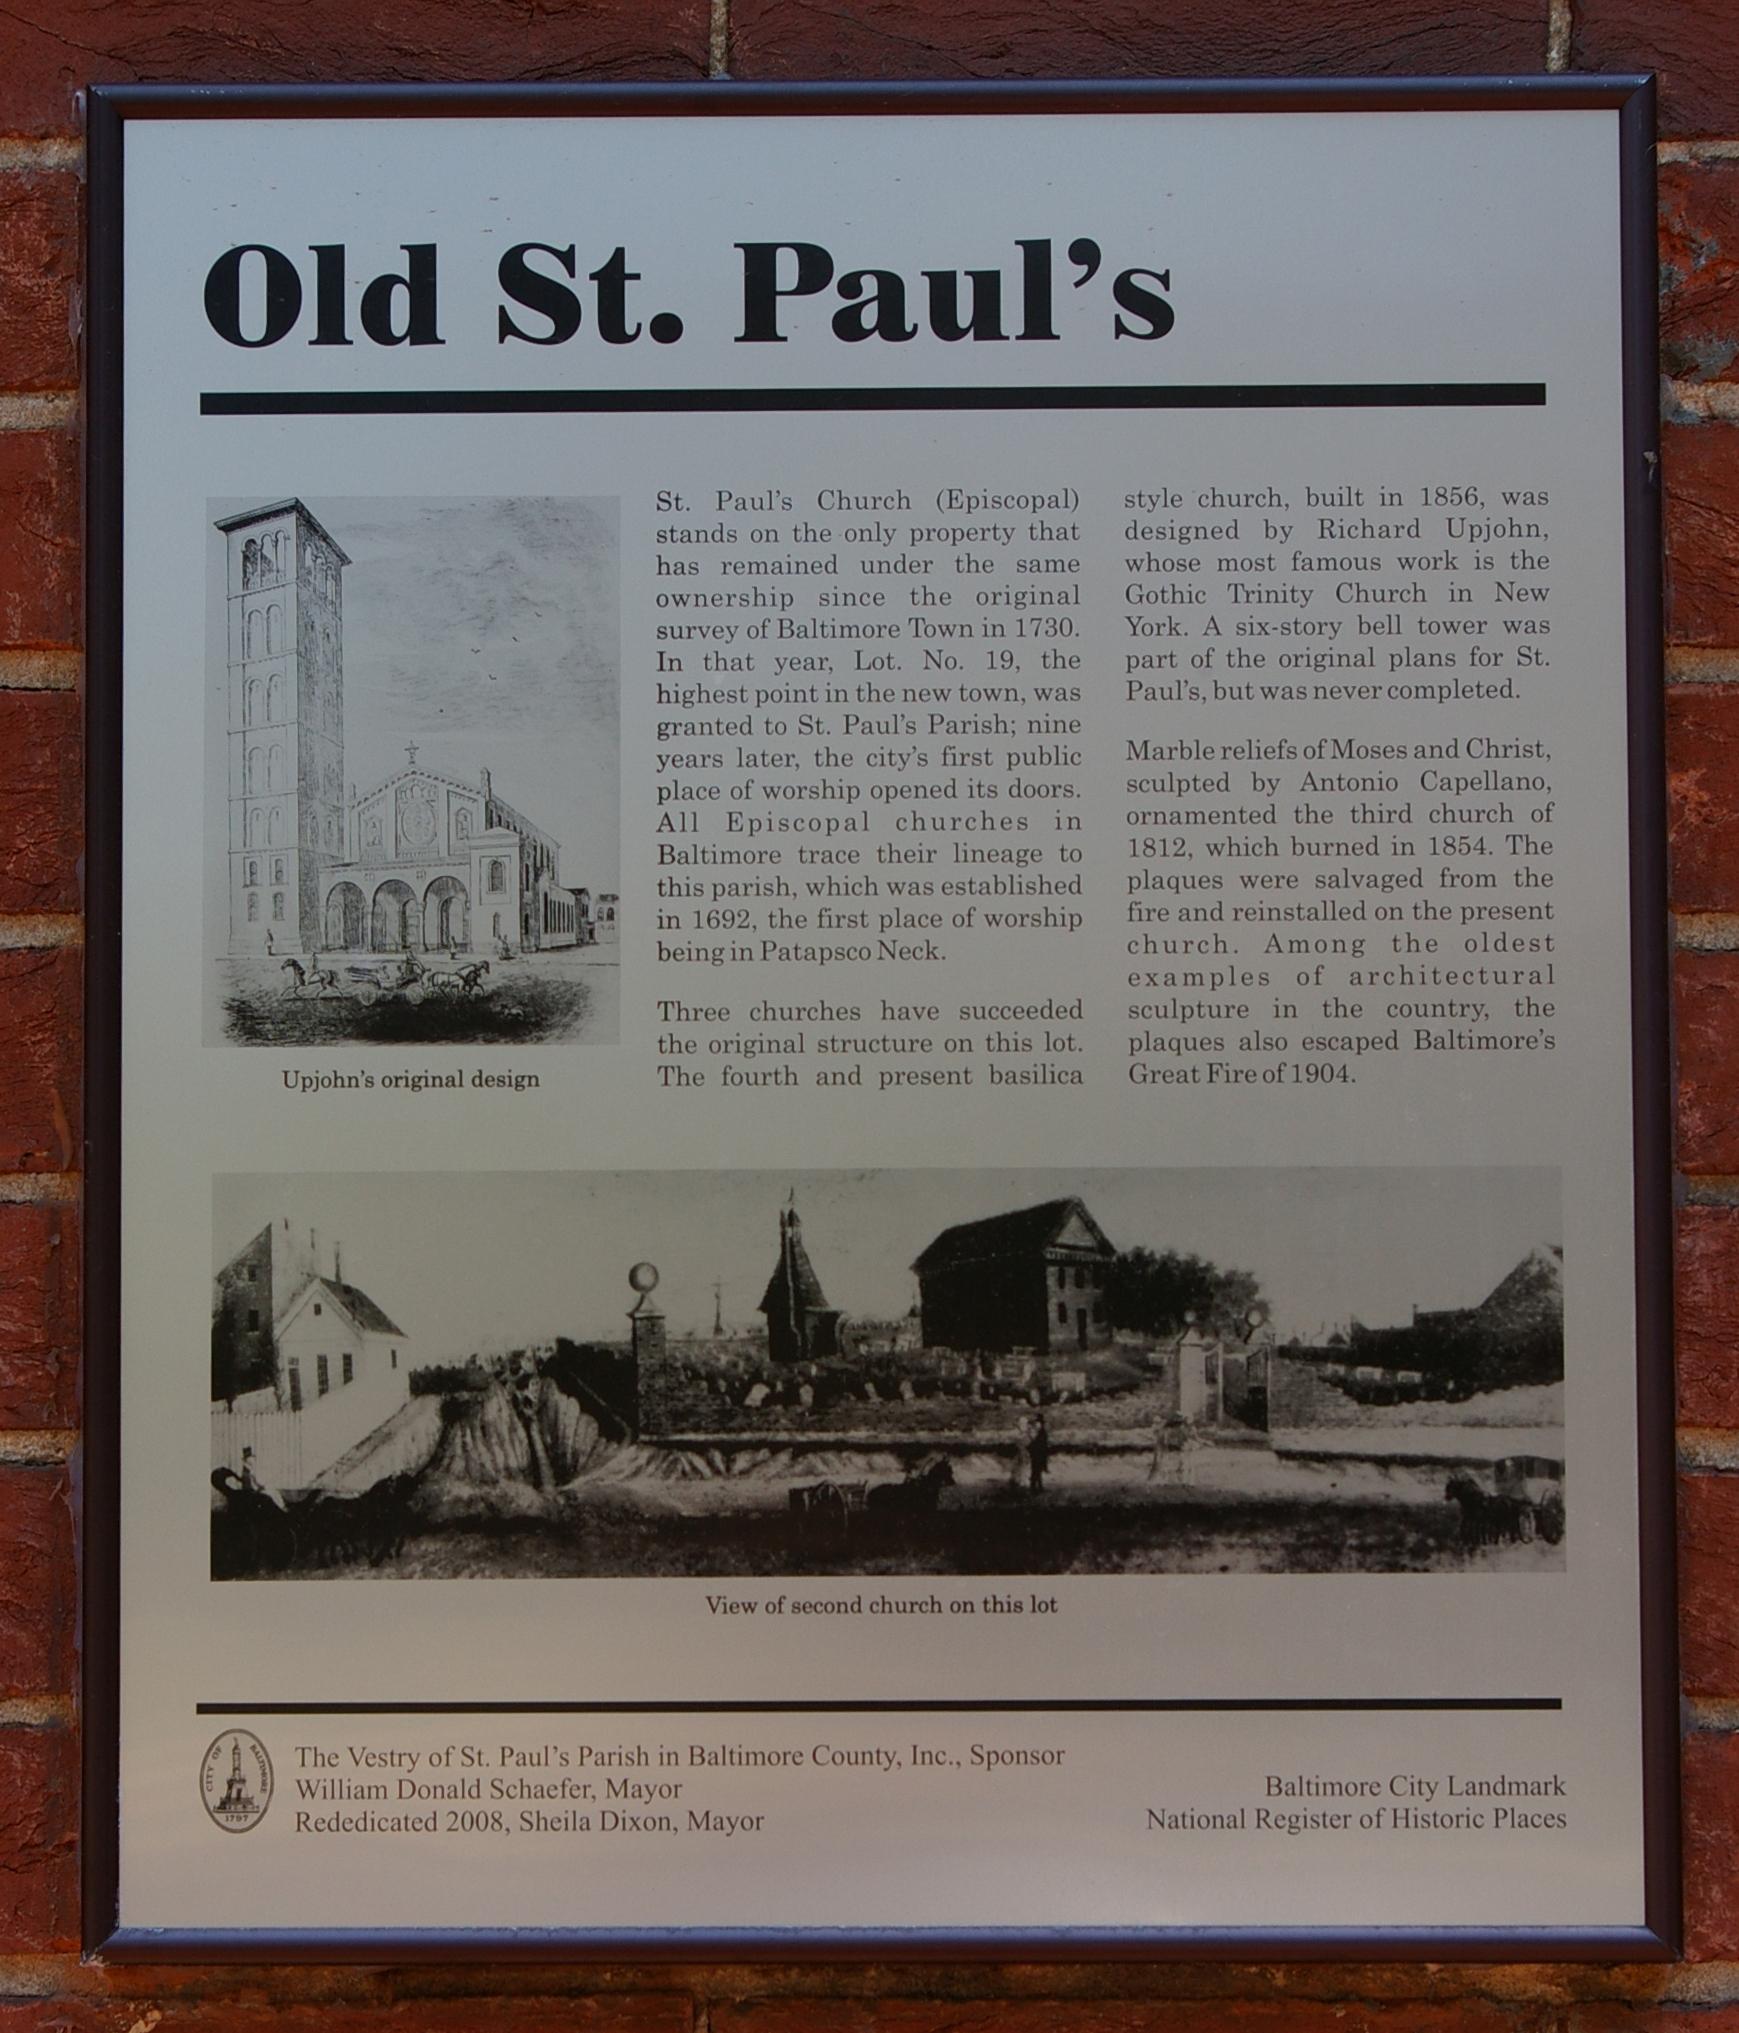 Old St. Paul's historical marker (source: http://www.hmdb.org/Marker.asp?Marker=92305)